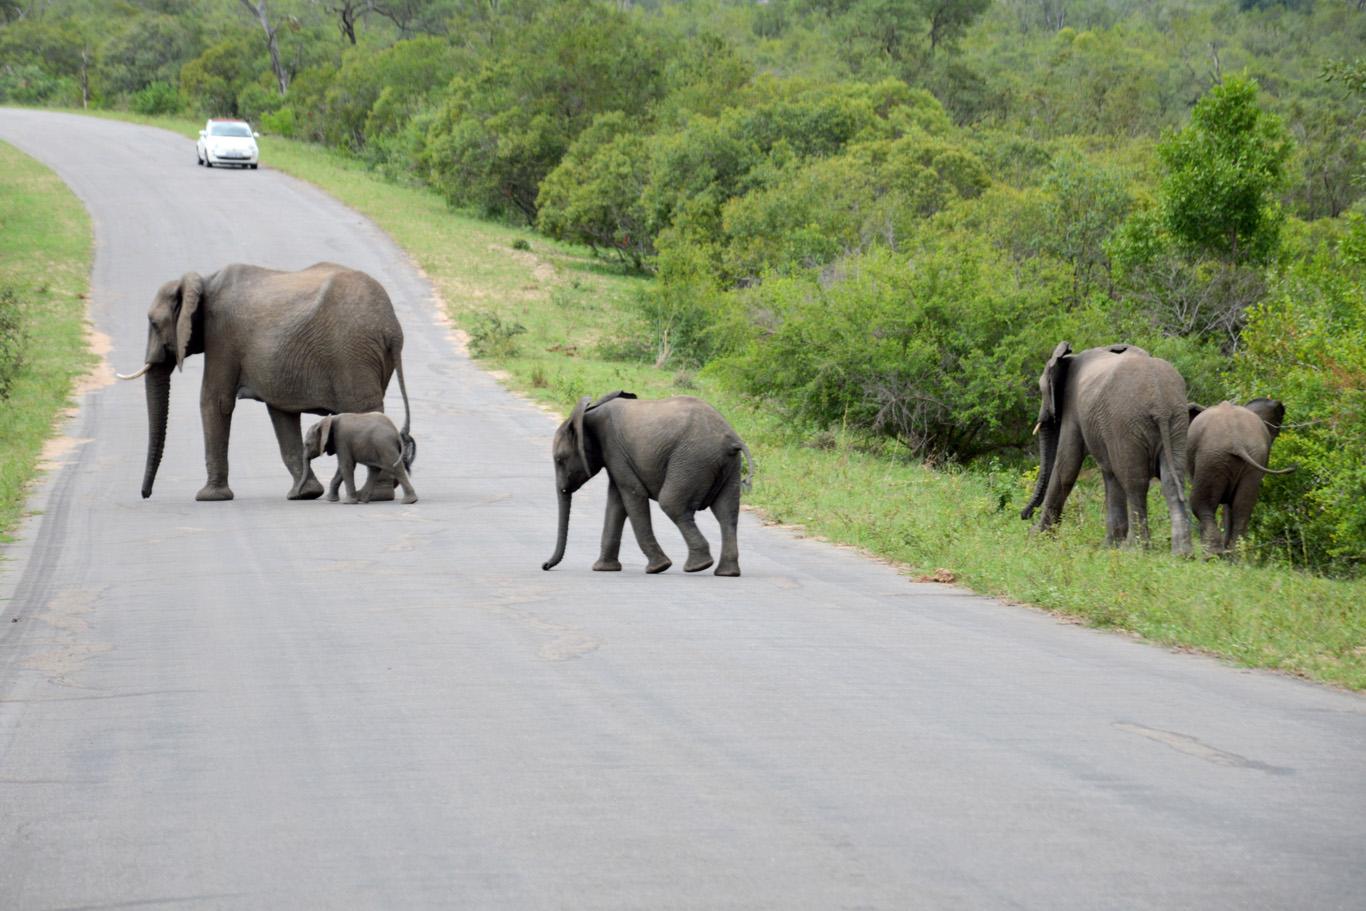 Elephants crossing a road